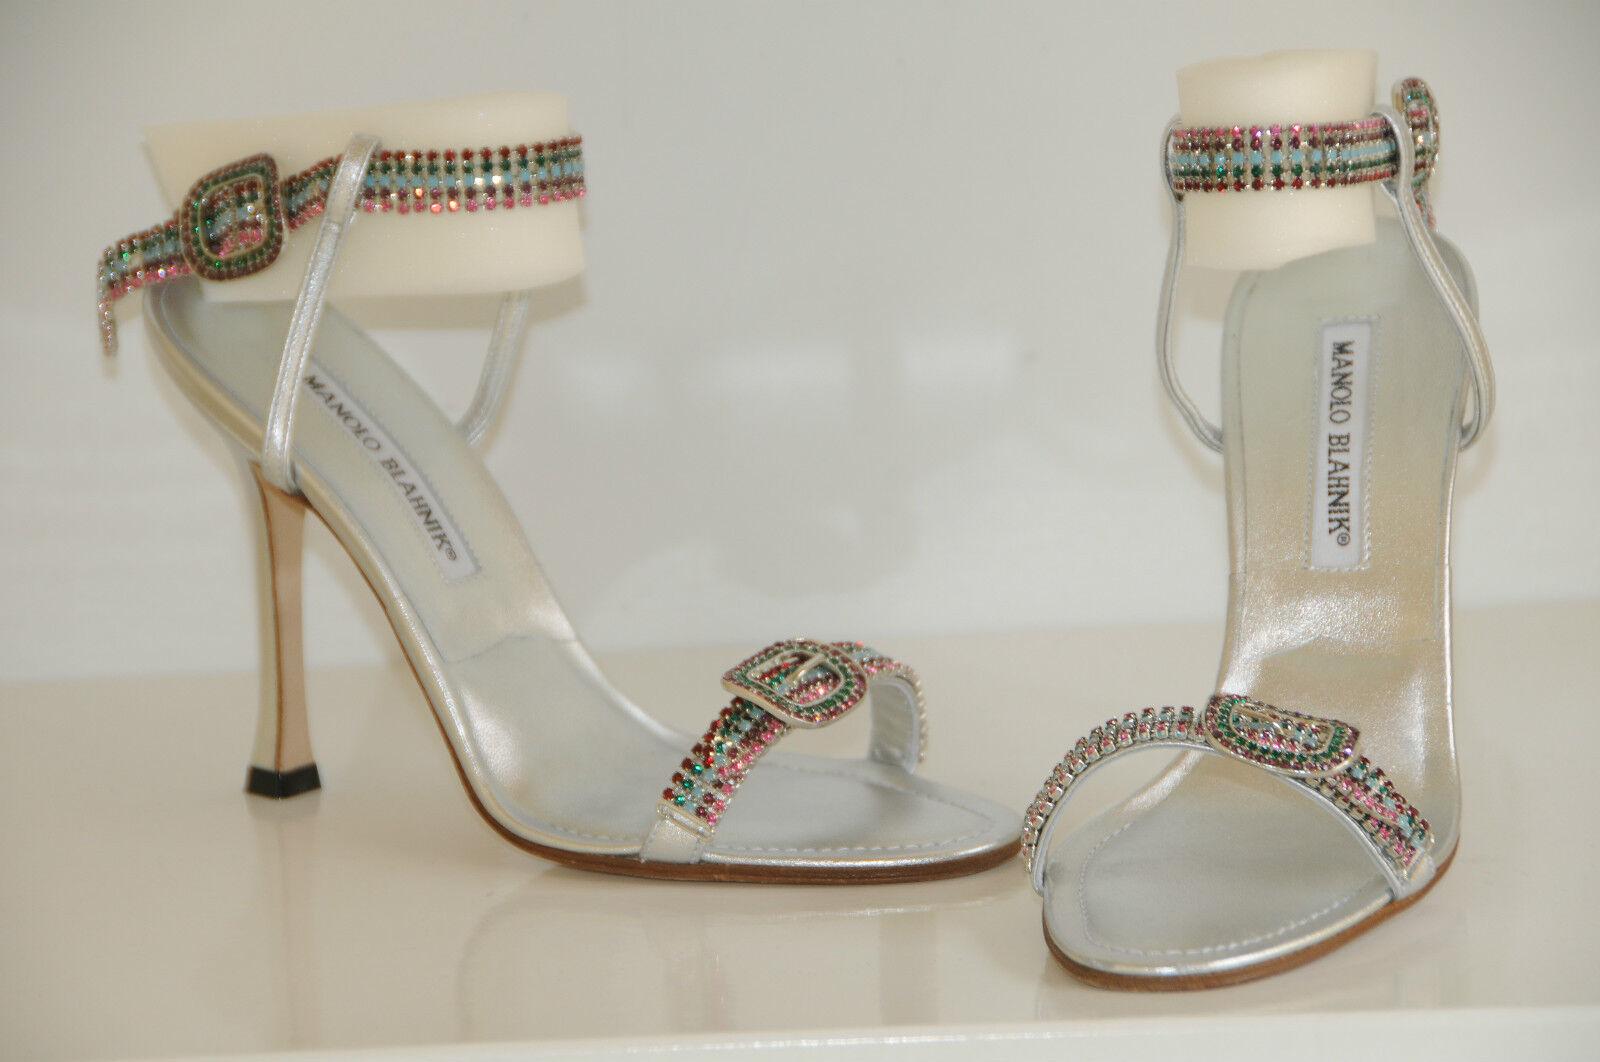 New MANOLO BLAHNIK SHOES JEWELED Crystals Silver JANETBA SHOES BLAHNIK 38.5 8 Wedding 1459d5